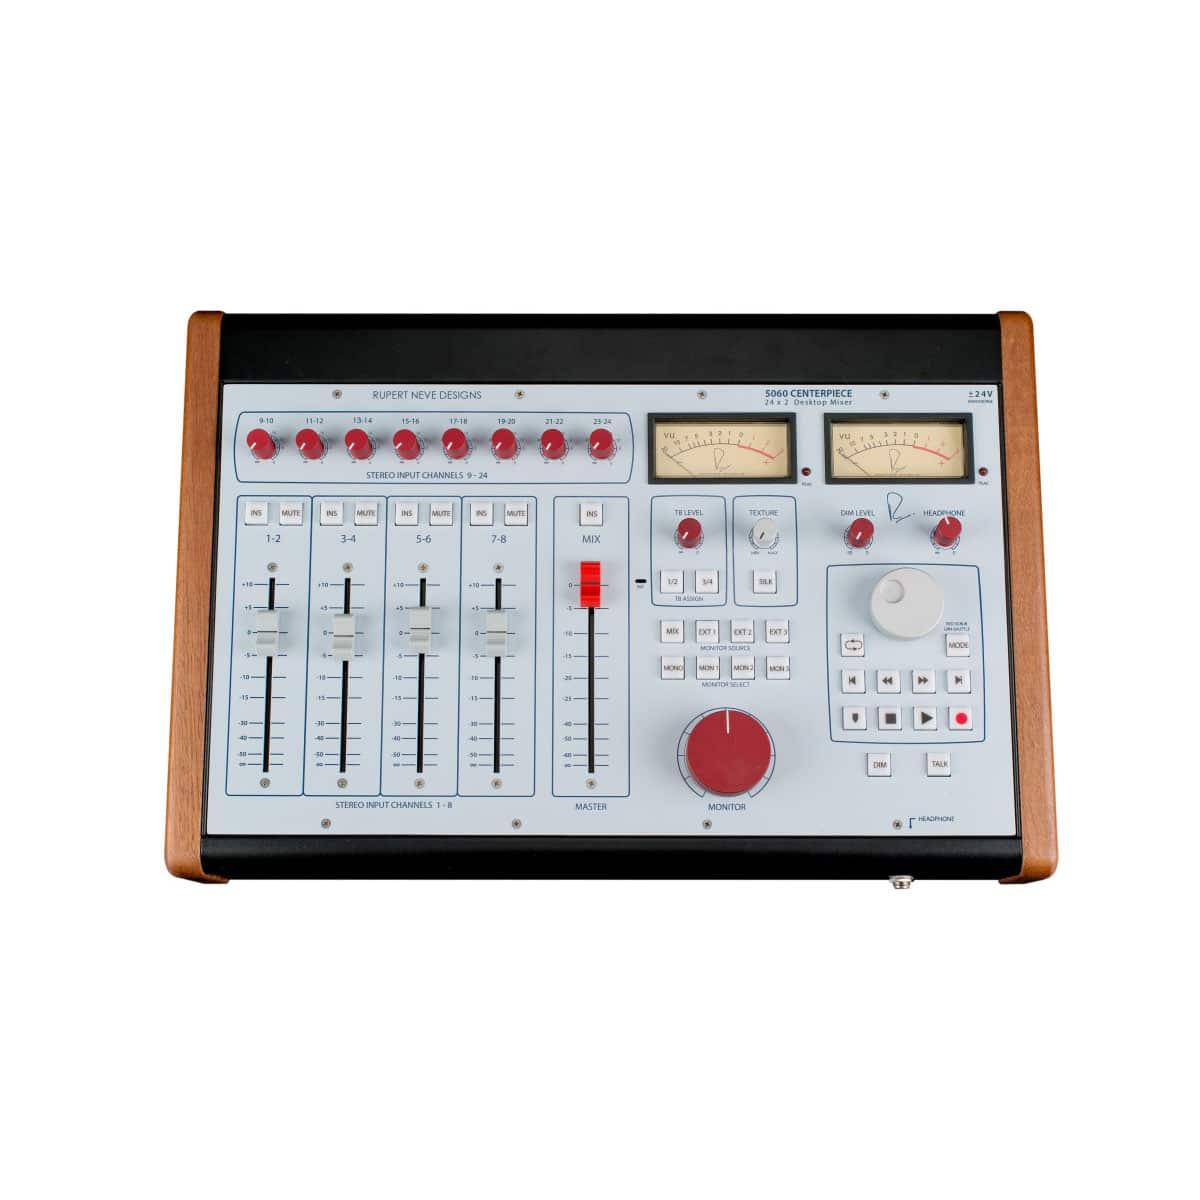 Rupert Neve 5060 Centerpiece 03 Pro Audio, Outboard, Sommatori e Mixer